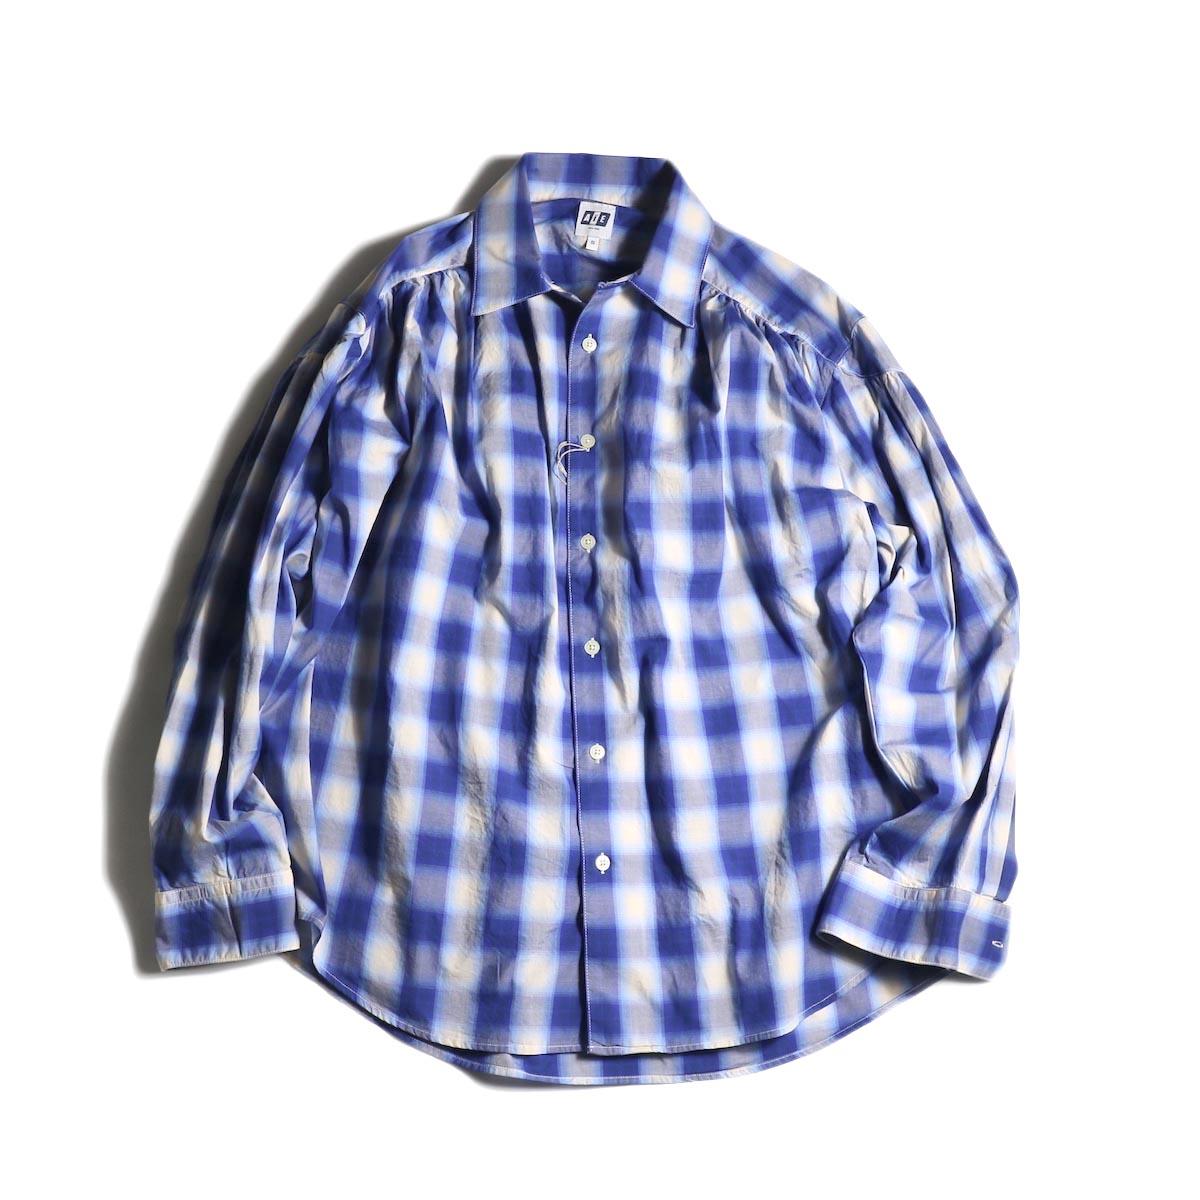 AiE / Painter Shirt -Shadow Plaid (Navy/White)